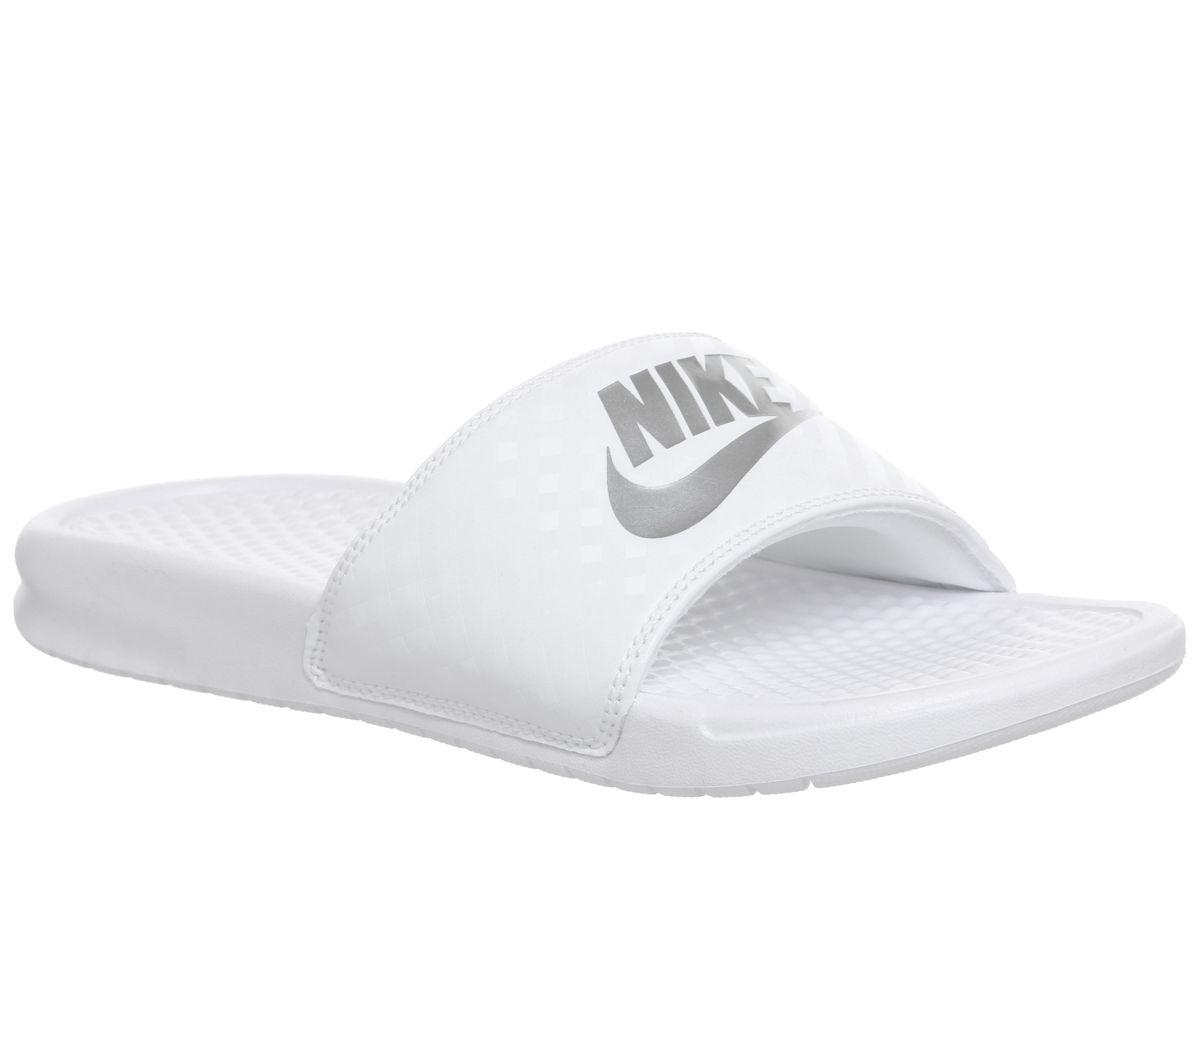 lowest price faa6d 5b639 Nike Benassi Sliders White Silver - Sandals